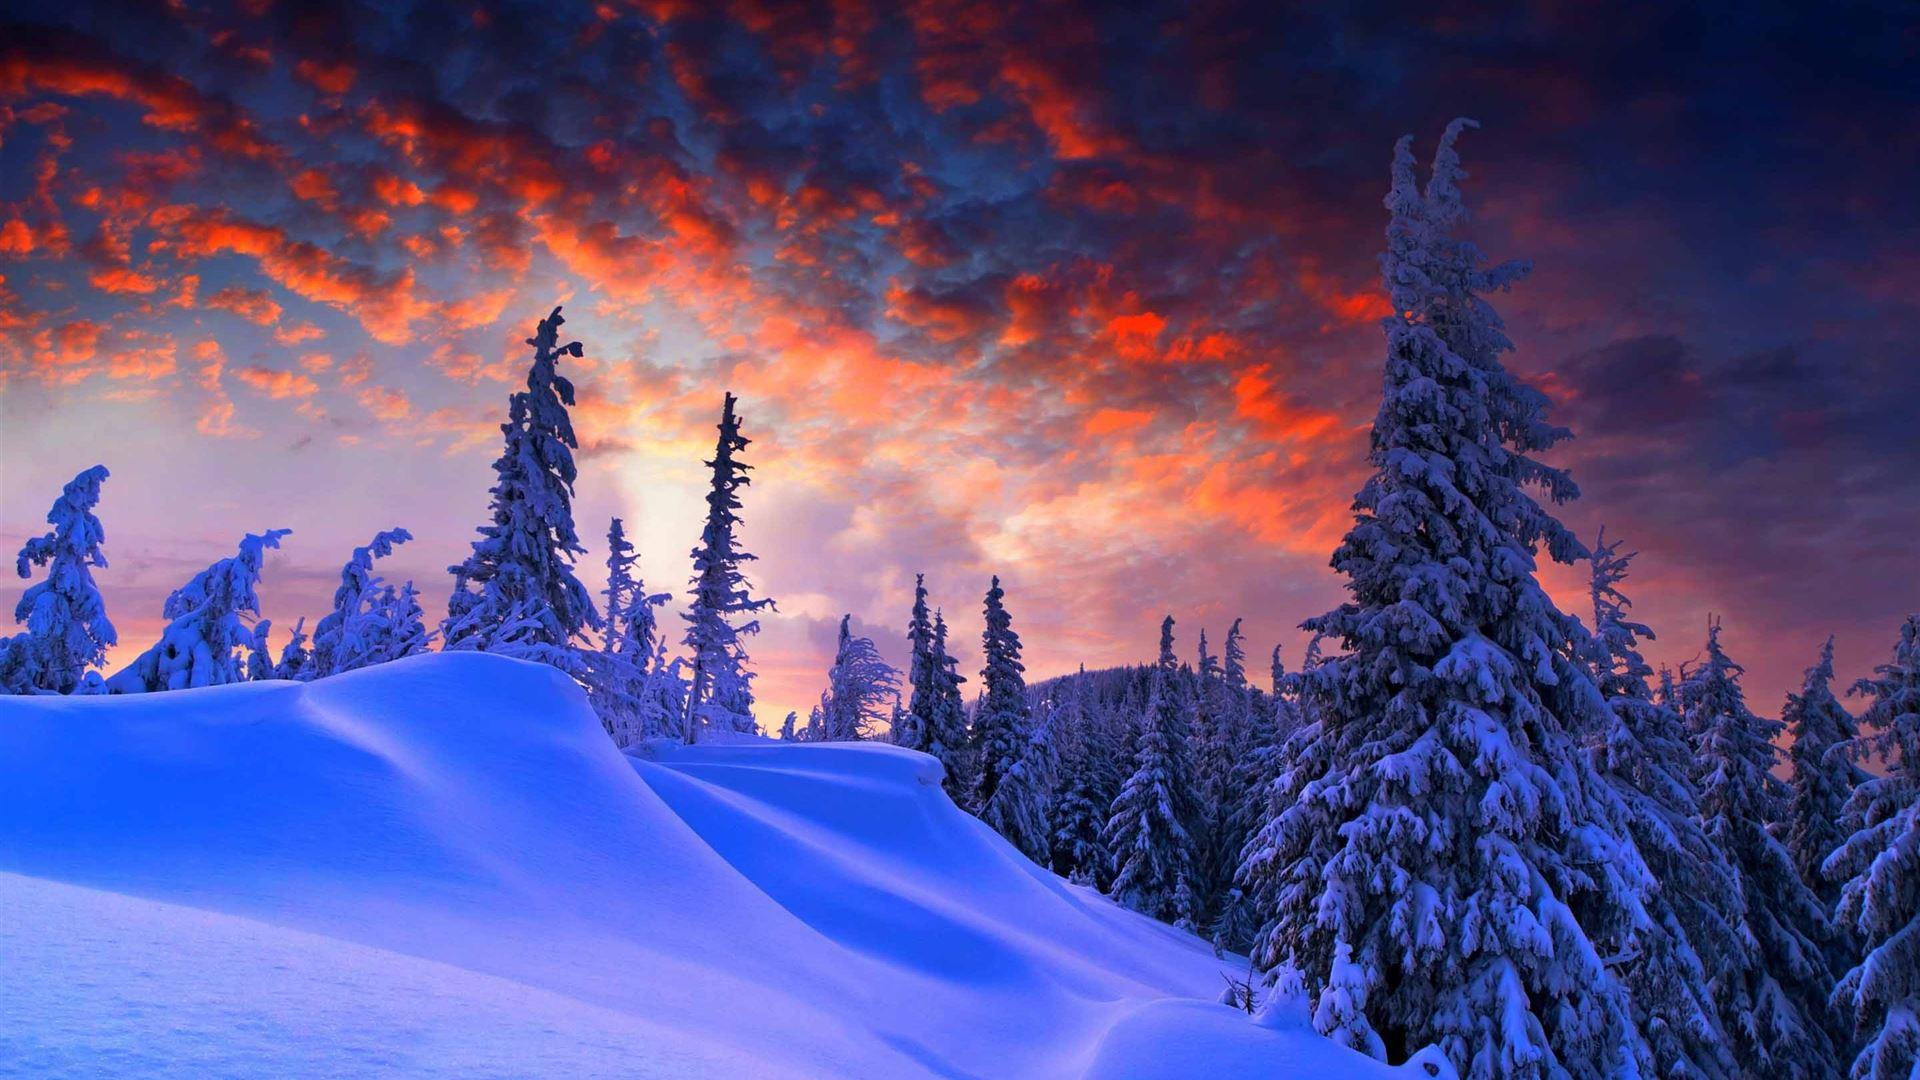 winter christmas mac wallpaper download | free mac wallpapers download